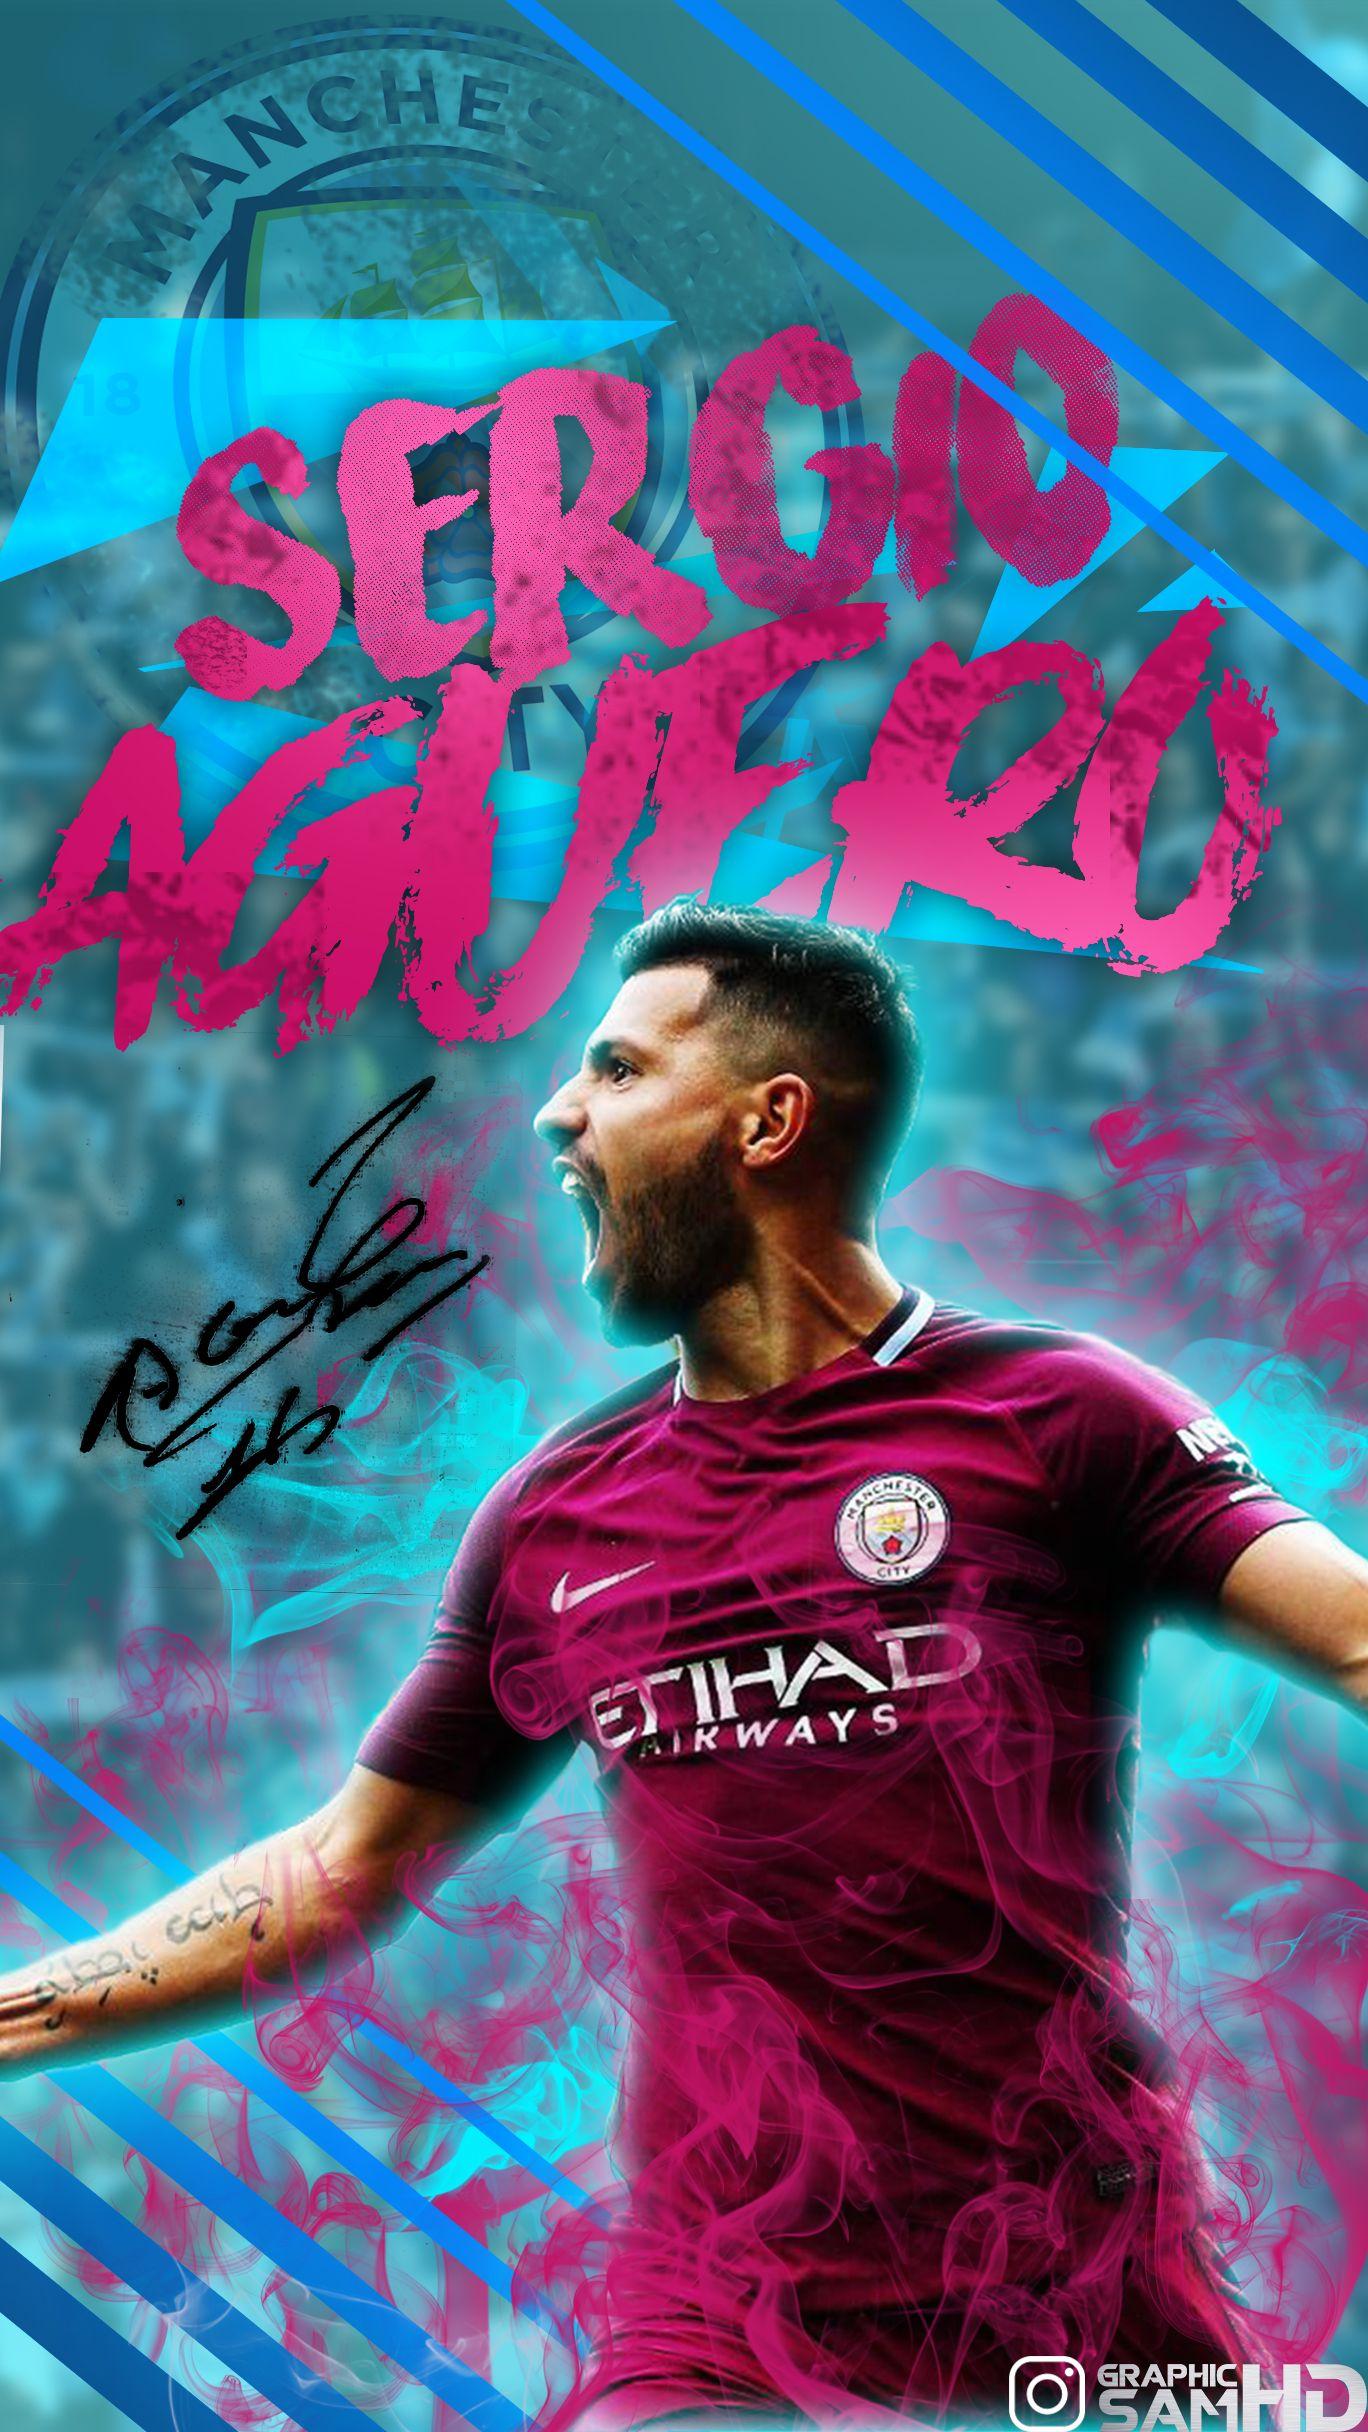 Sergio Agüero Phone Wallpaper 20172018 Wandi Manchester City